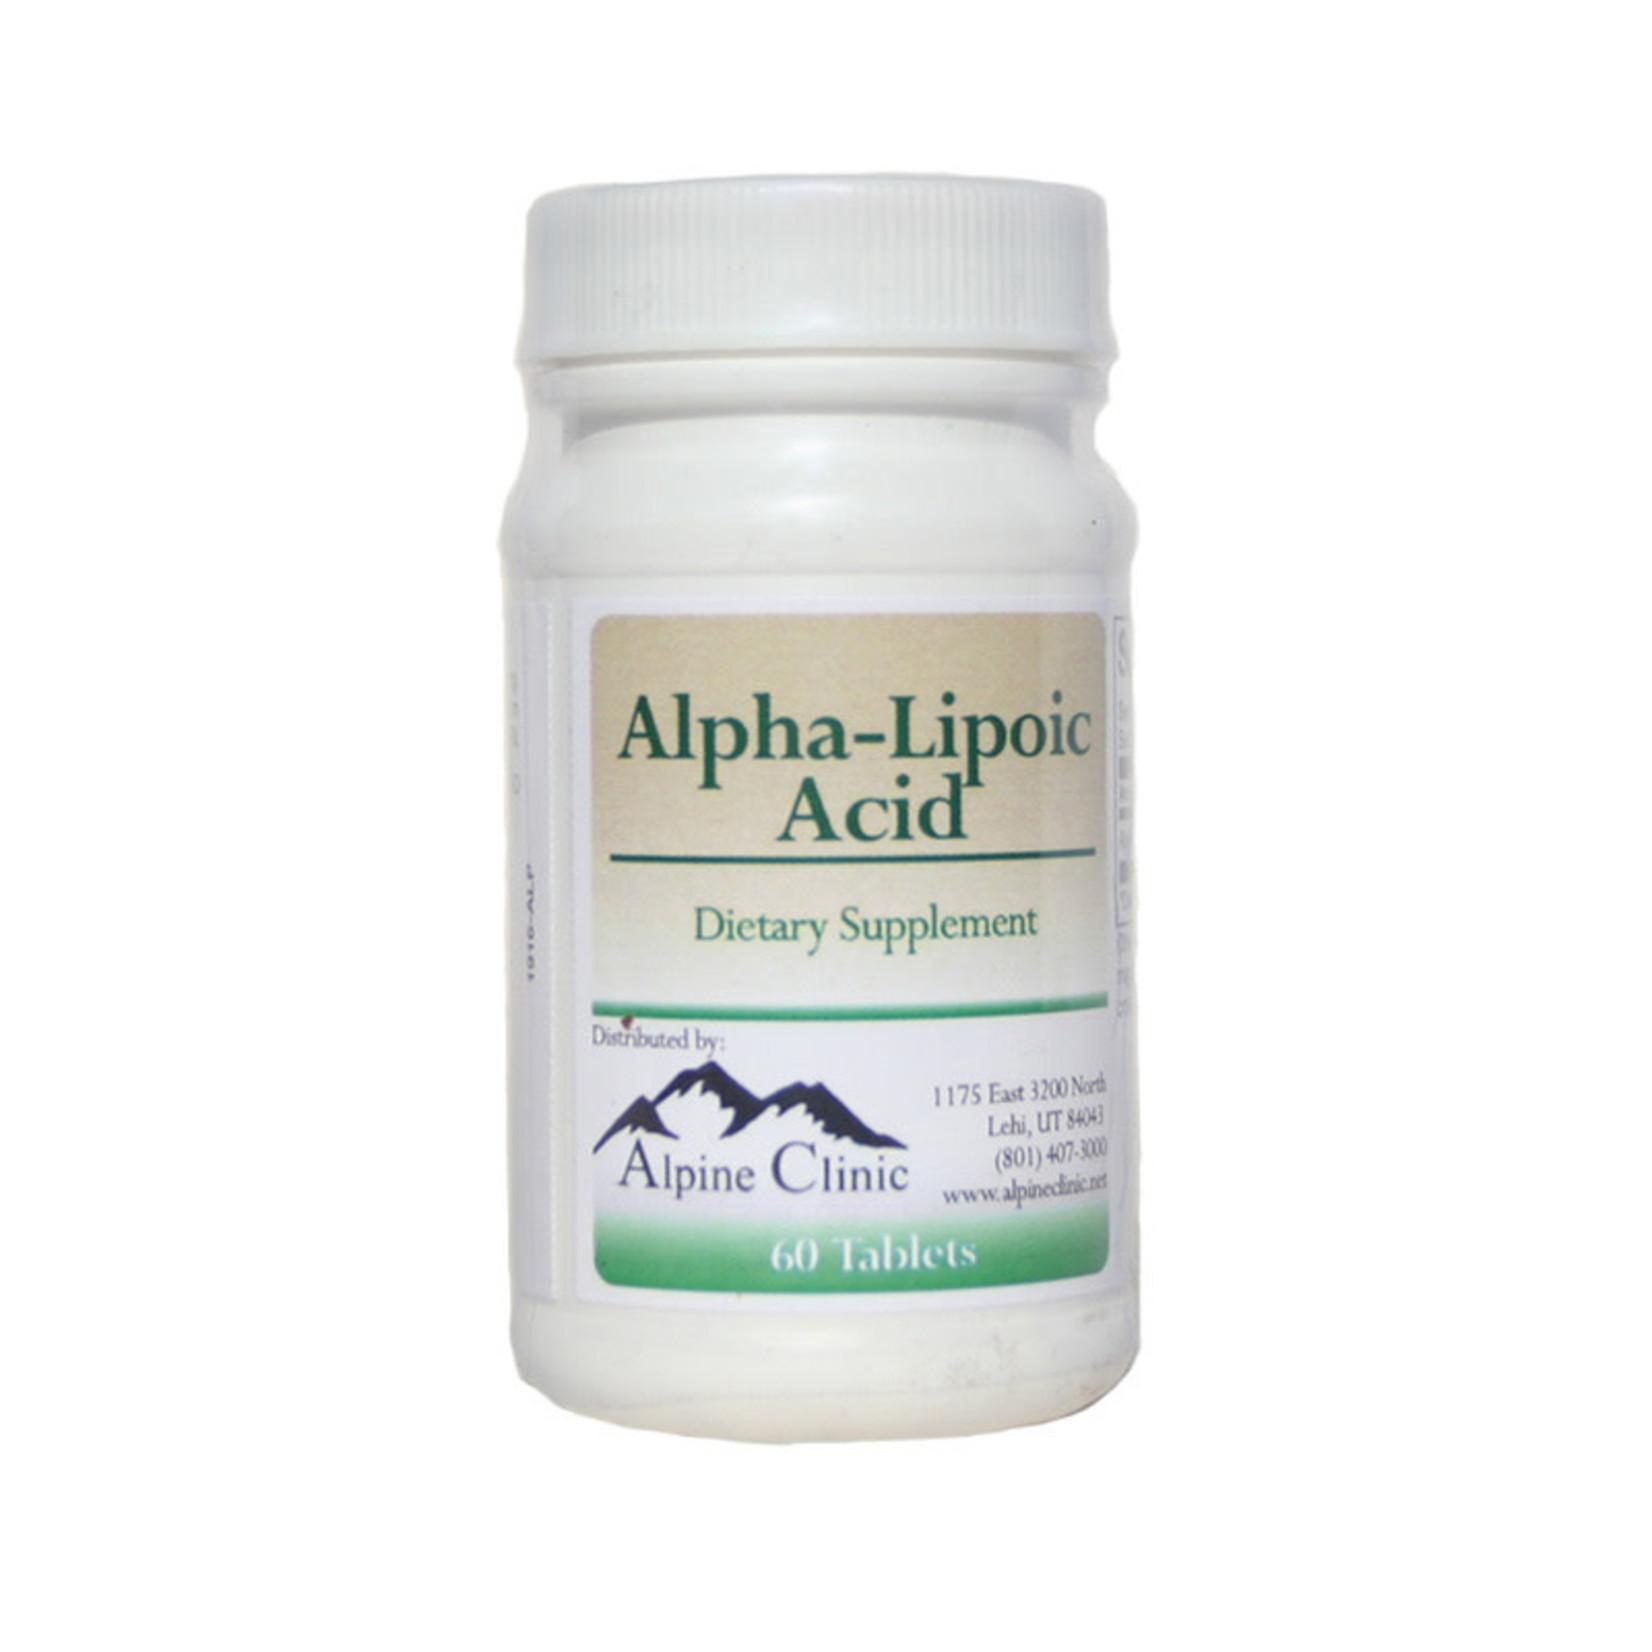 Alpine Clinic PL Alpha-Lipoic Acid